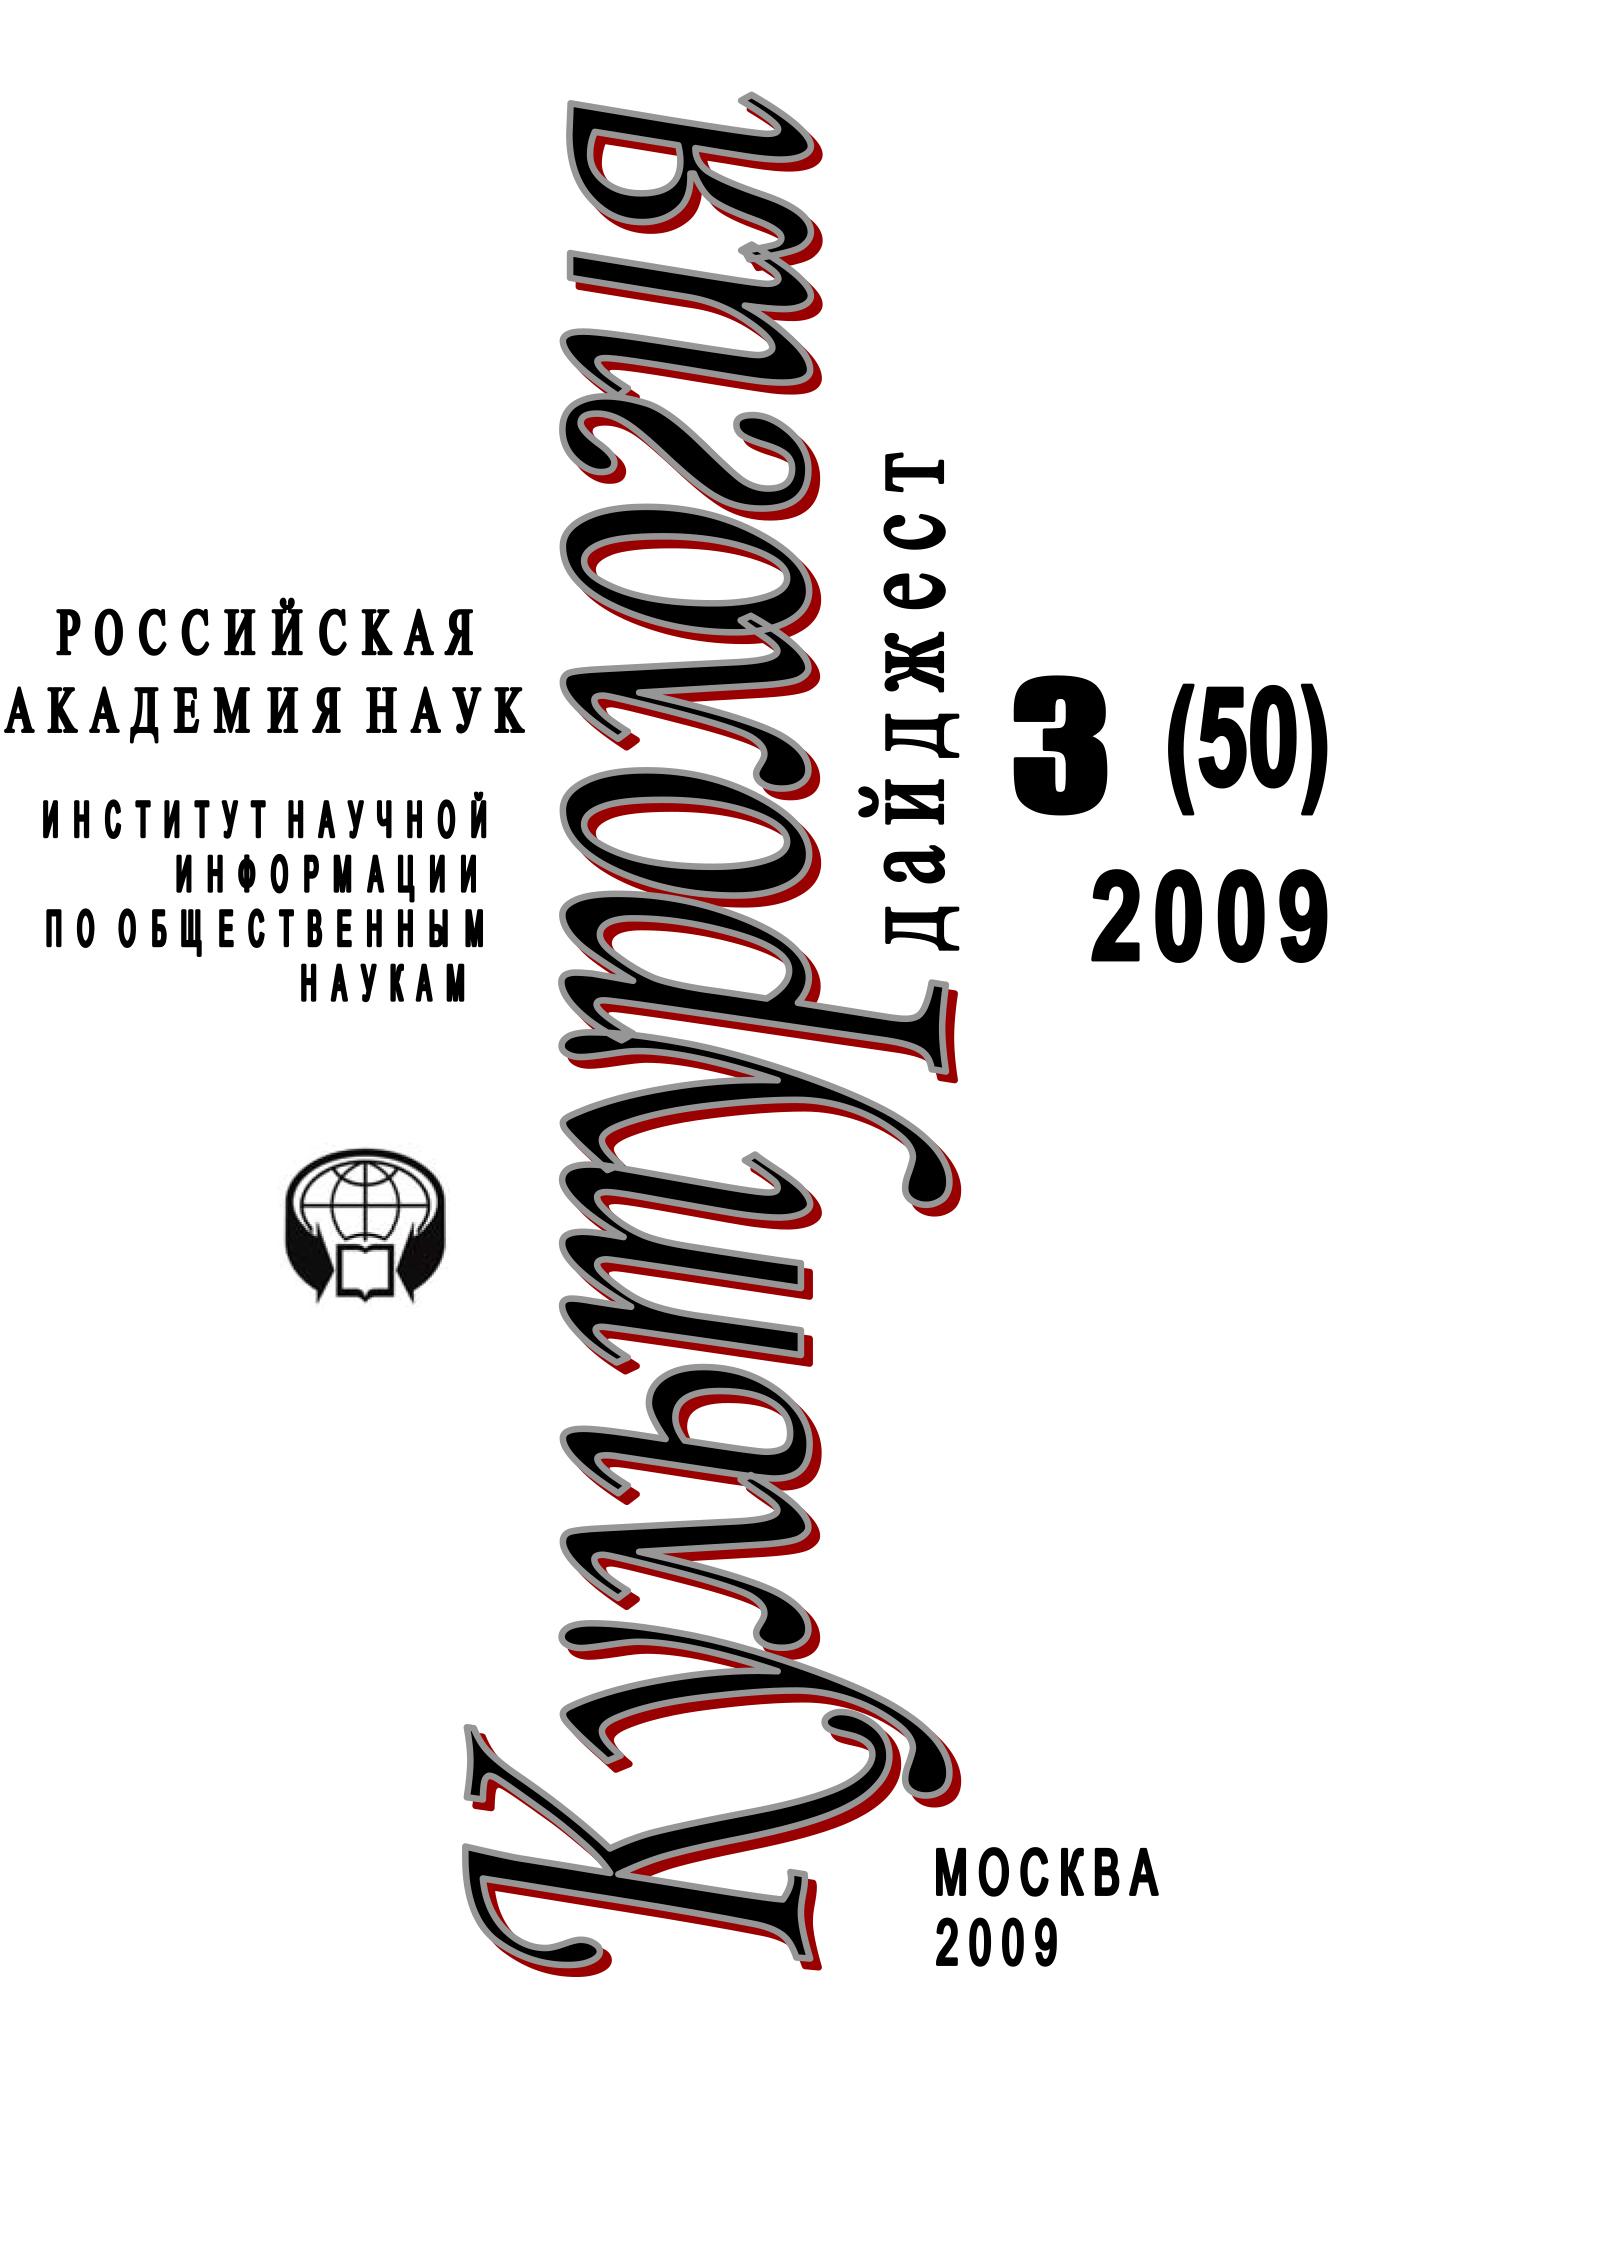 Ирина Галинская Культурология: Дайджест №3 / 2009 ирина галинская культурология дайджест 1 2015